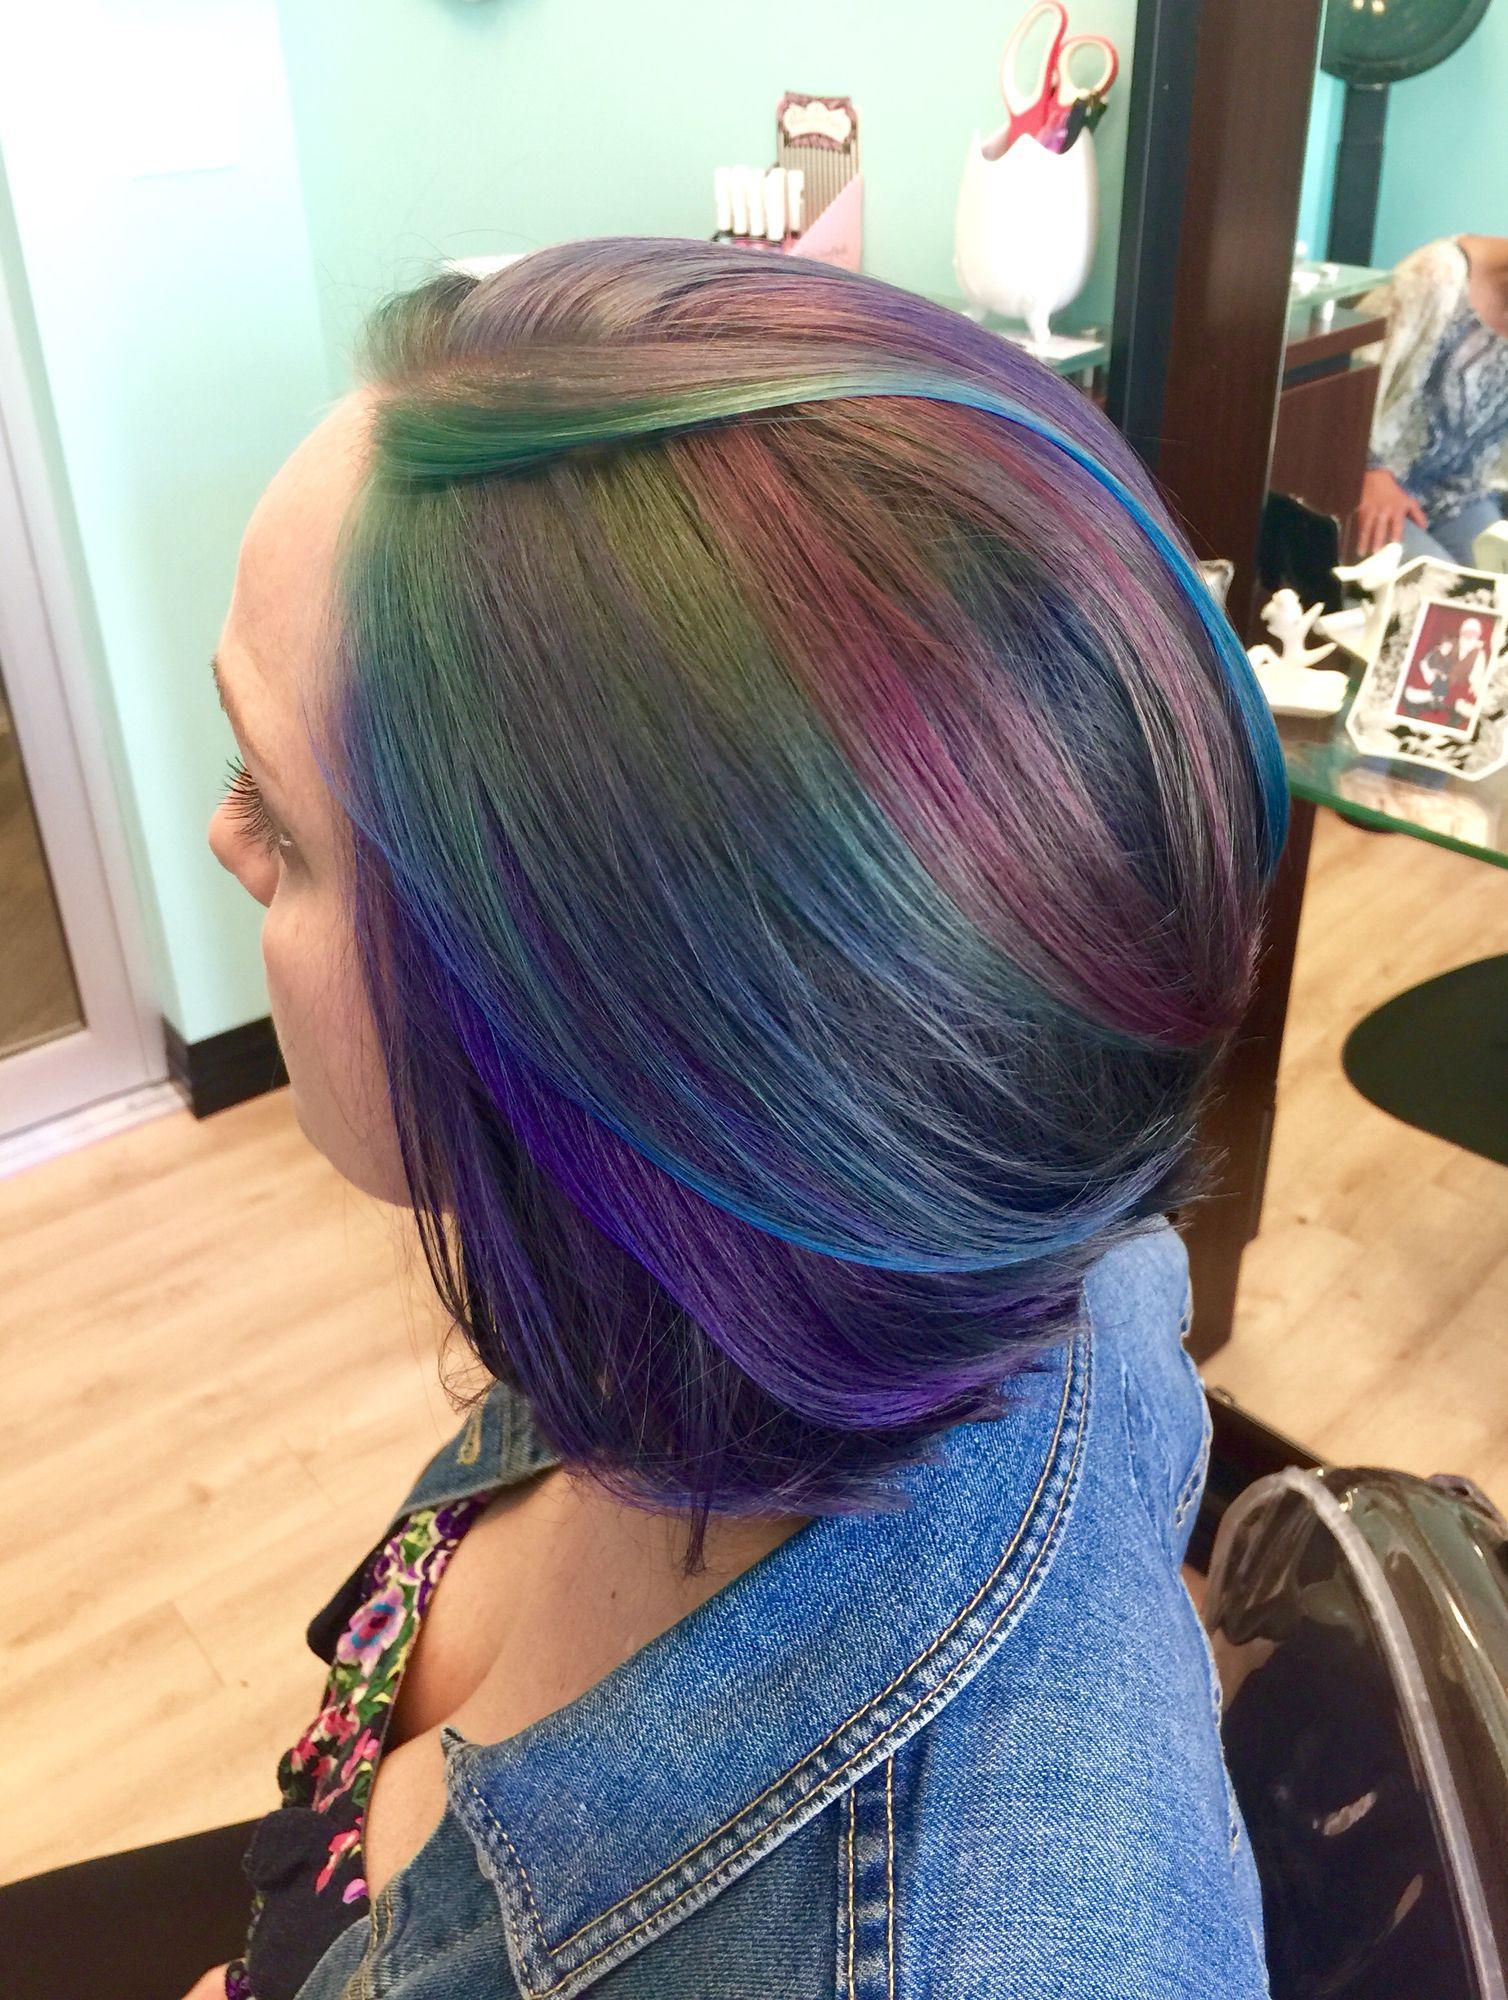 Oilslick/Galaxy/mermaid hair by Nicole at Nicole's Beauty Box, down town St. Pete, FL